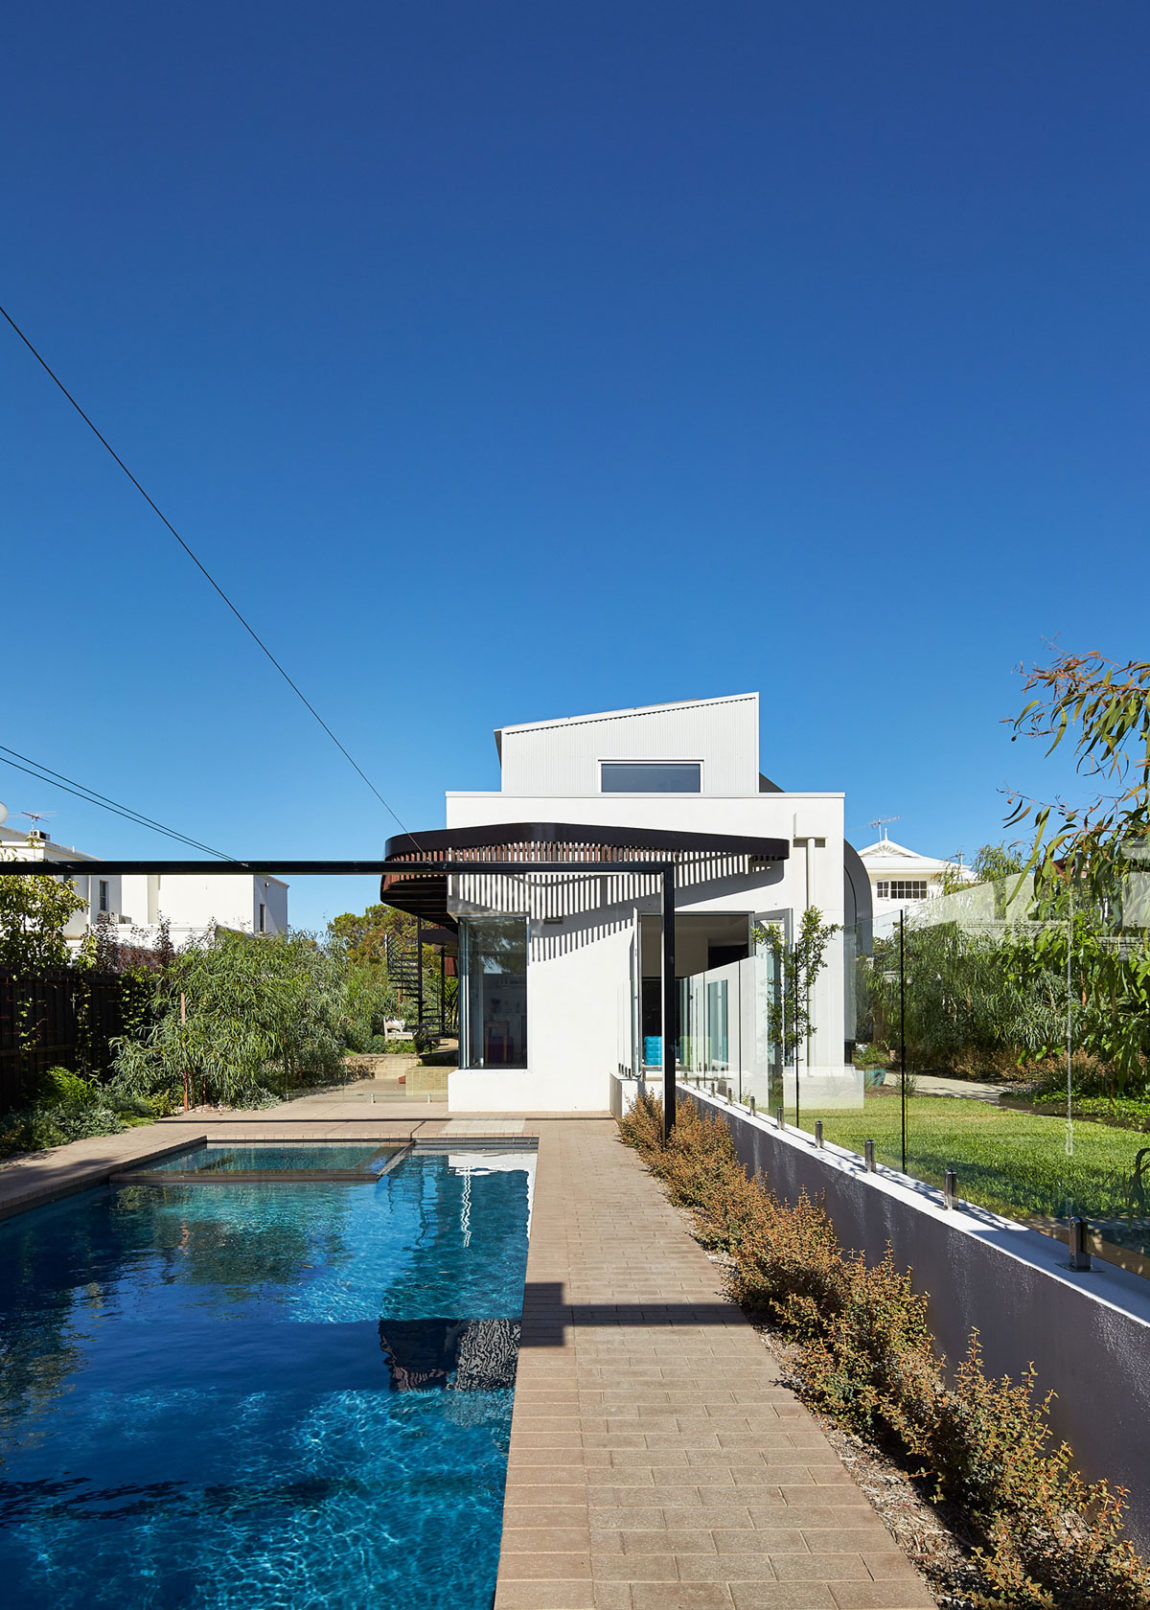 Mosman Bay Residence by Iredale Pedersen Hook Architects (10)